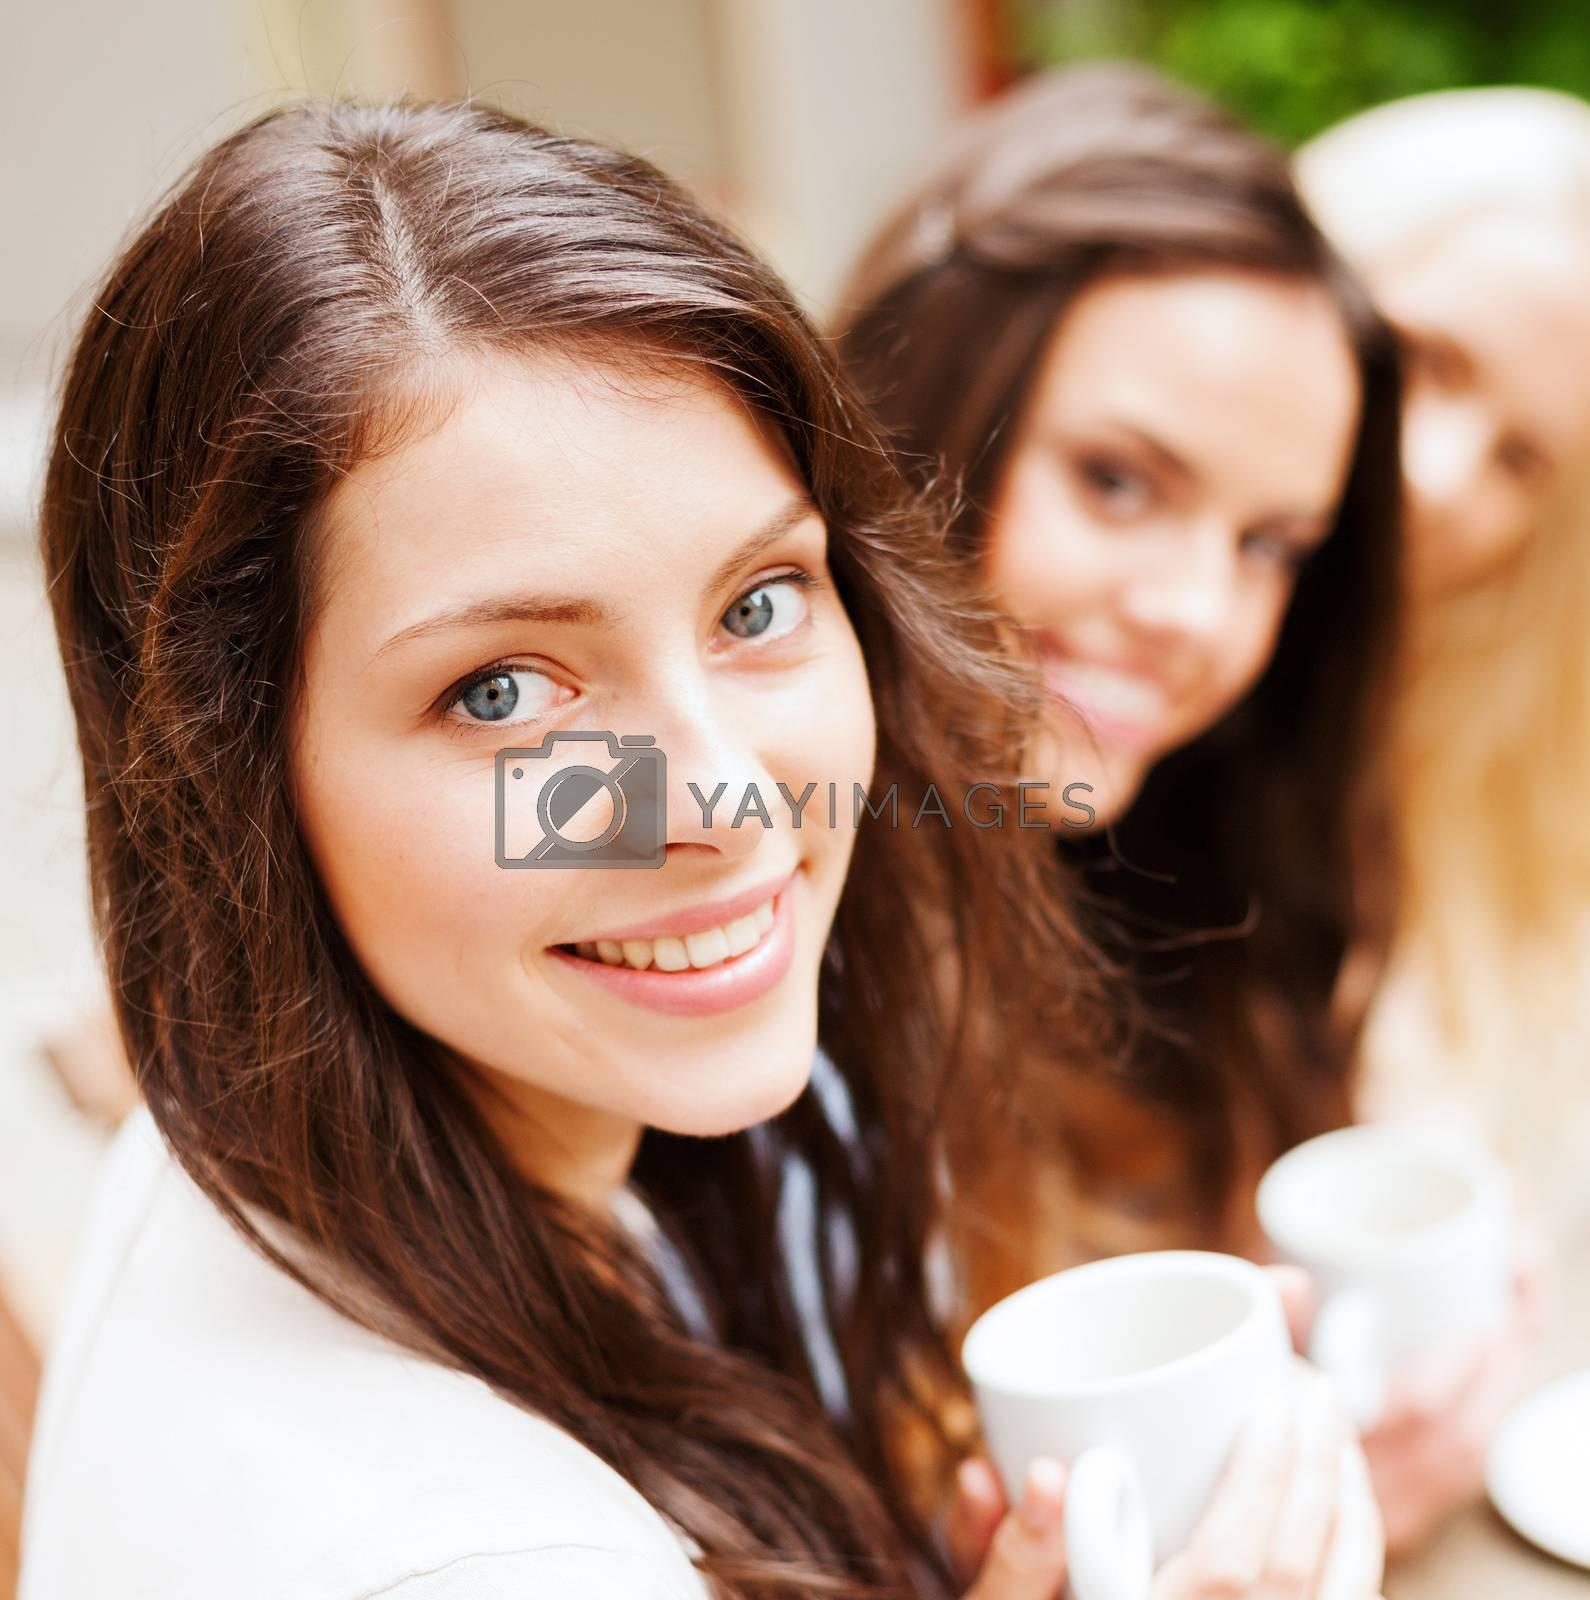 beautiful girls drinking coffee in cafe by dolgachov